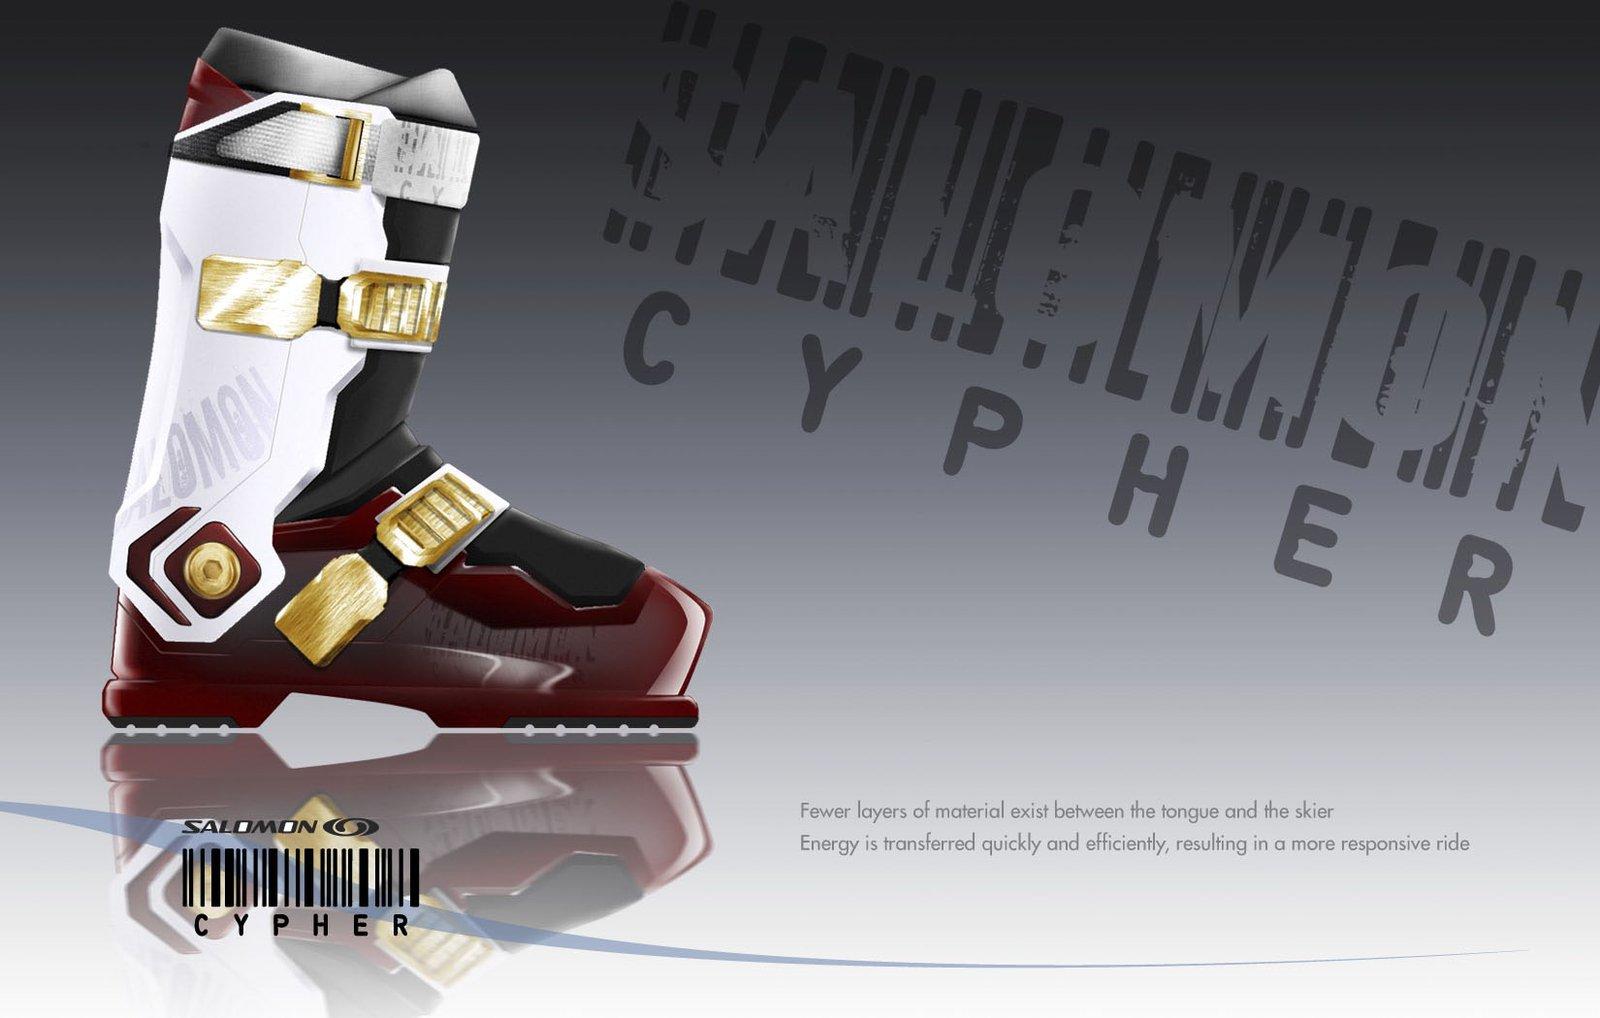 Salomon Cypher